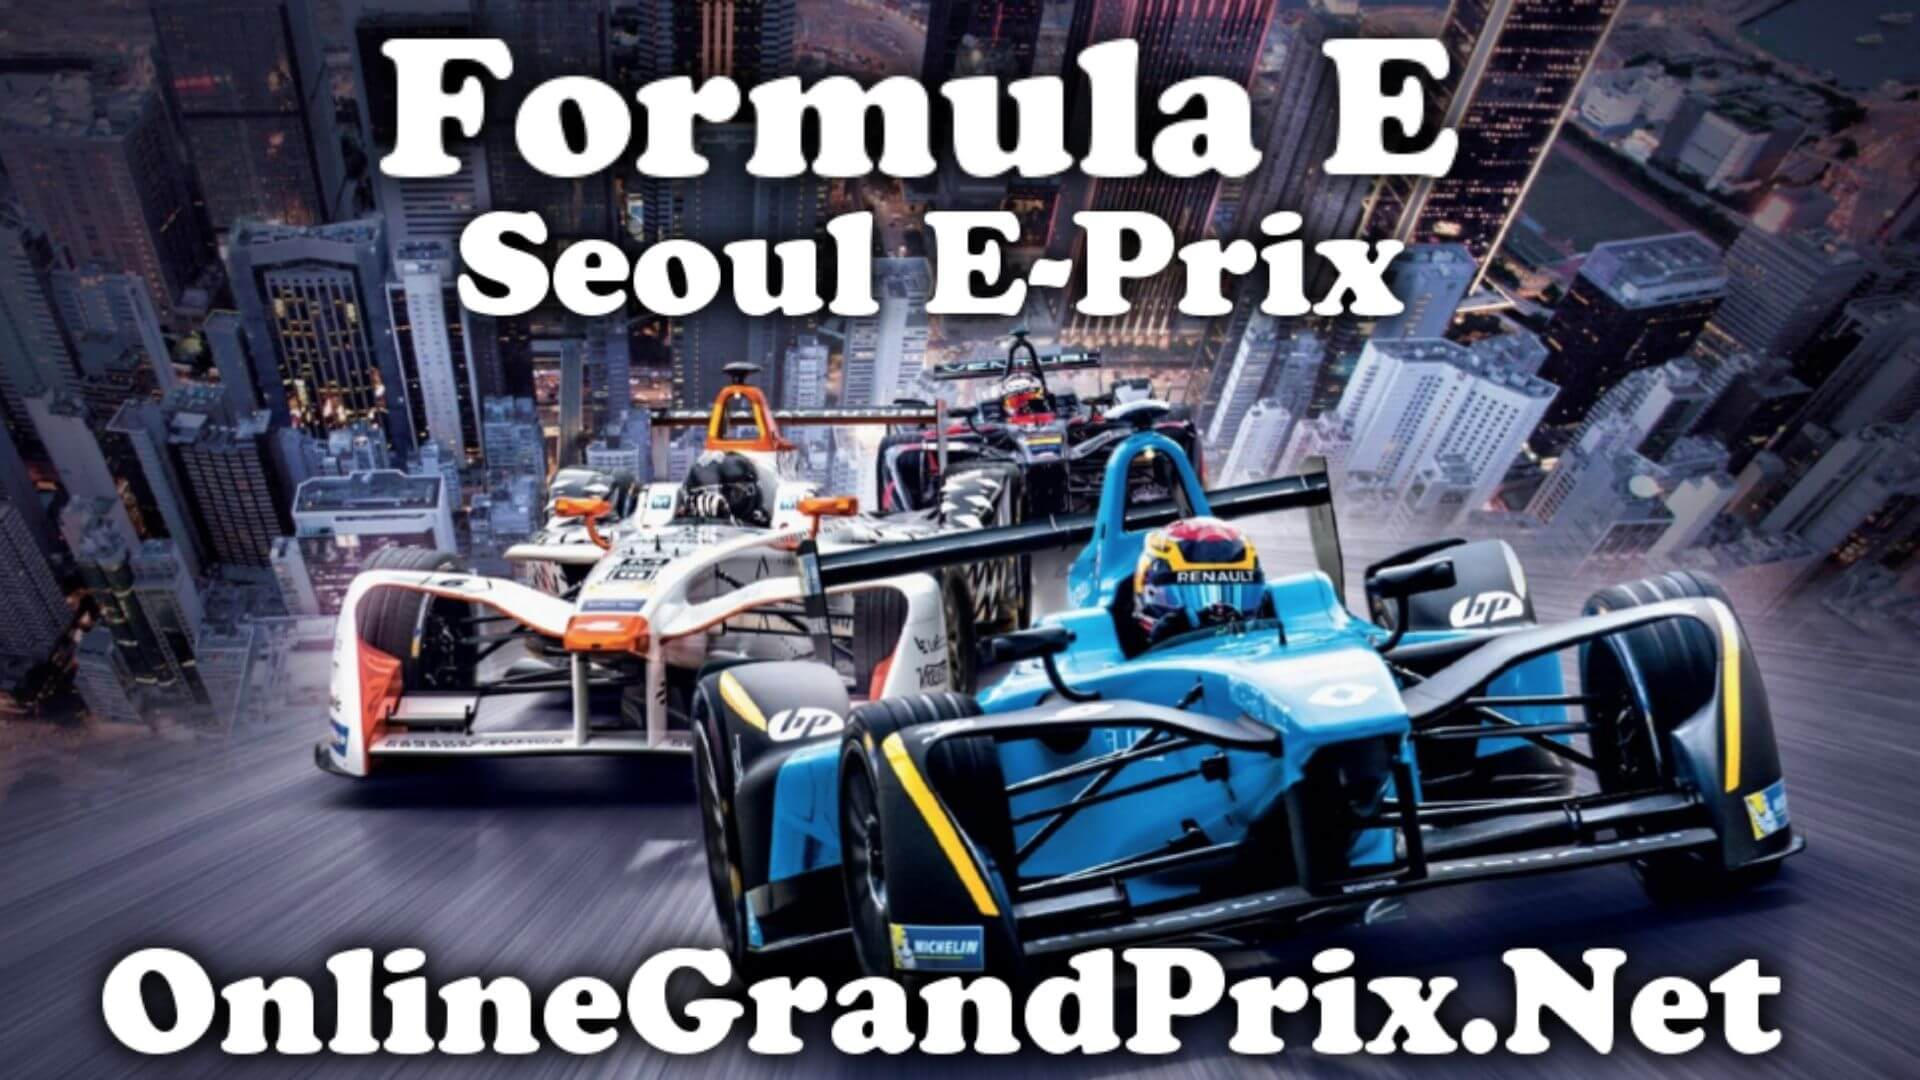 Seoul EPrix FE Live Stream 2020 | Full Race Replay